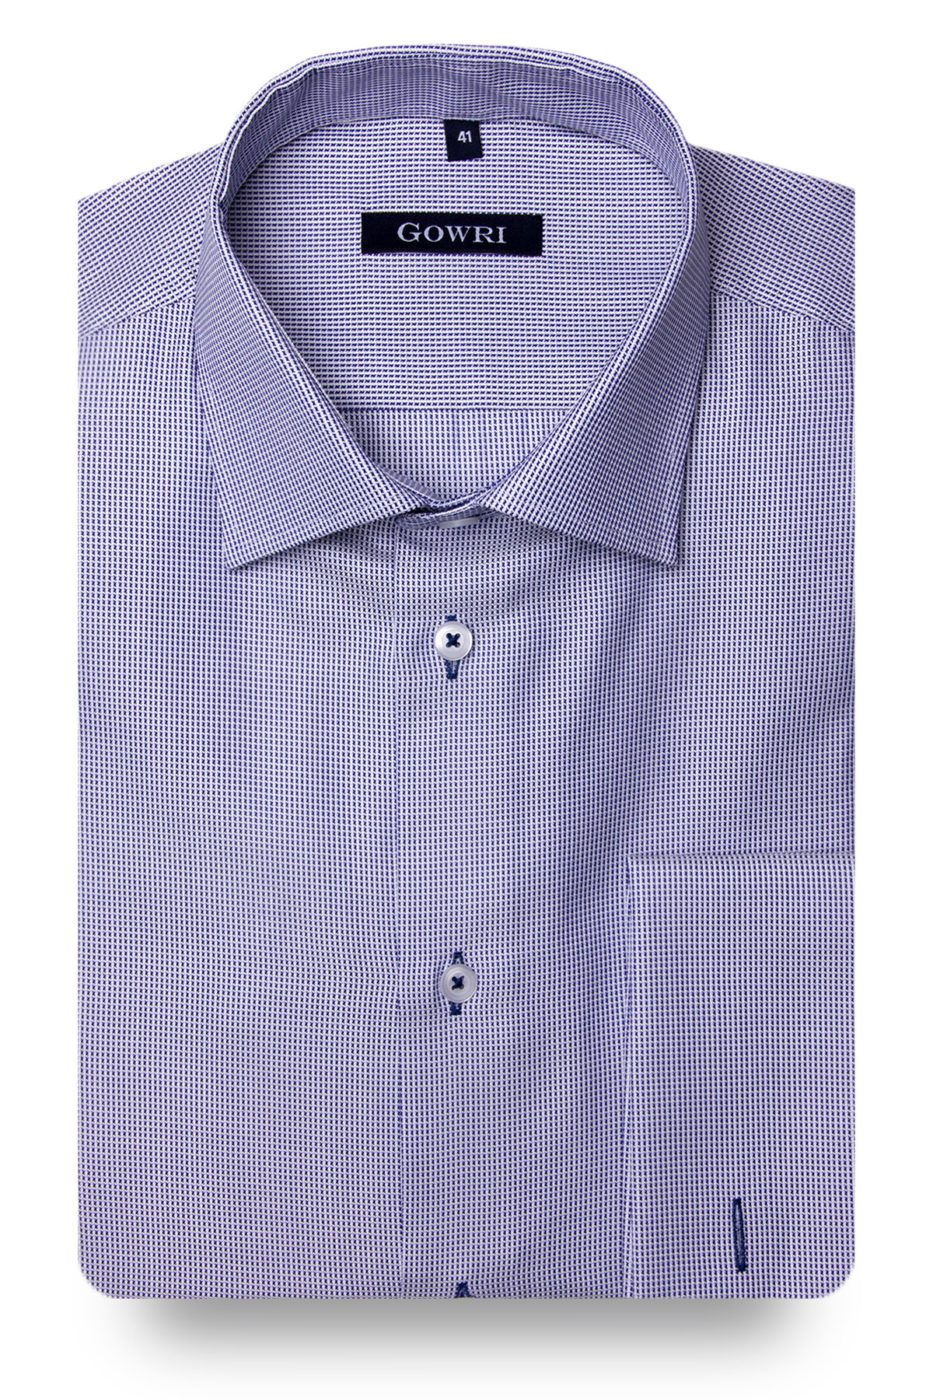 Panama Blue Shirt